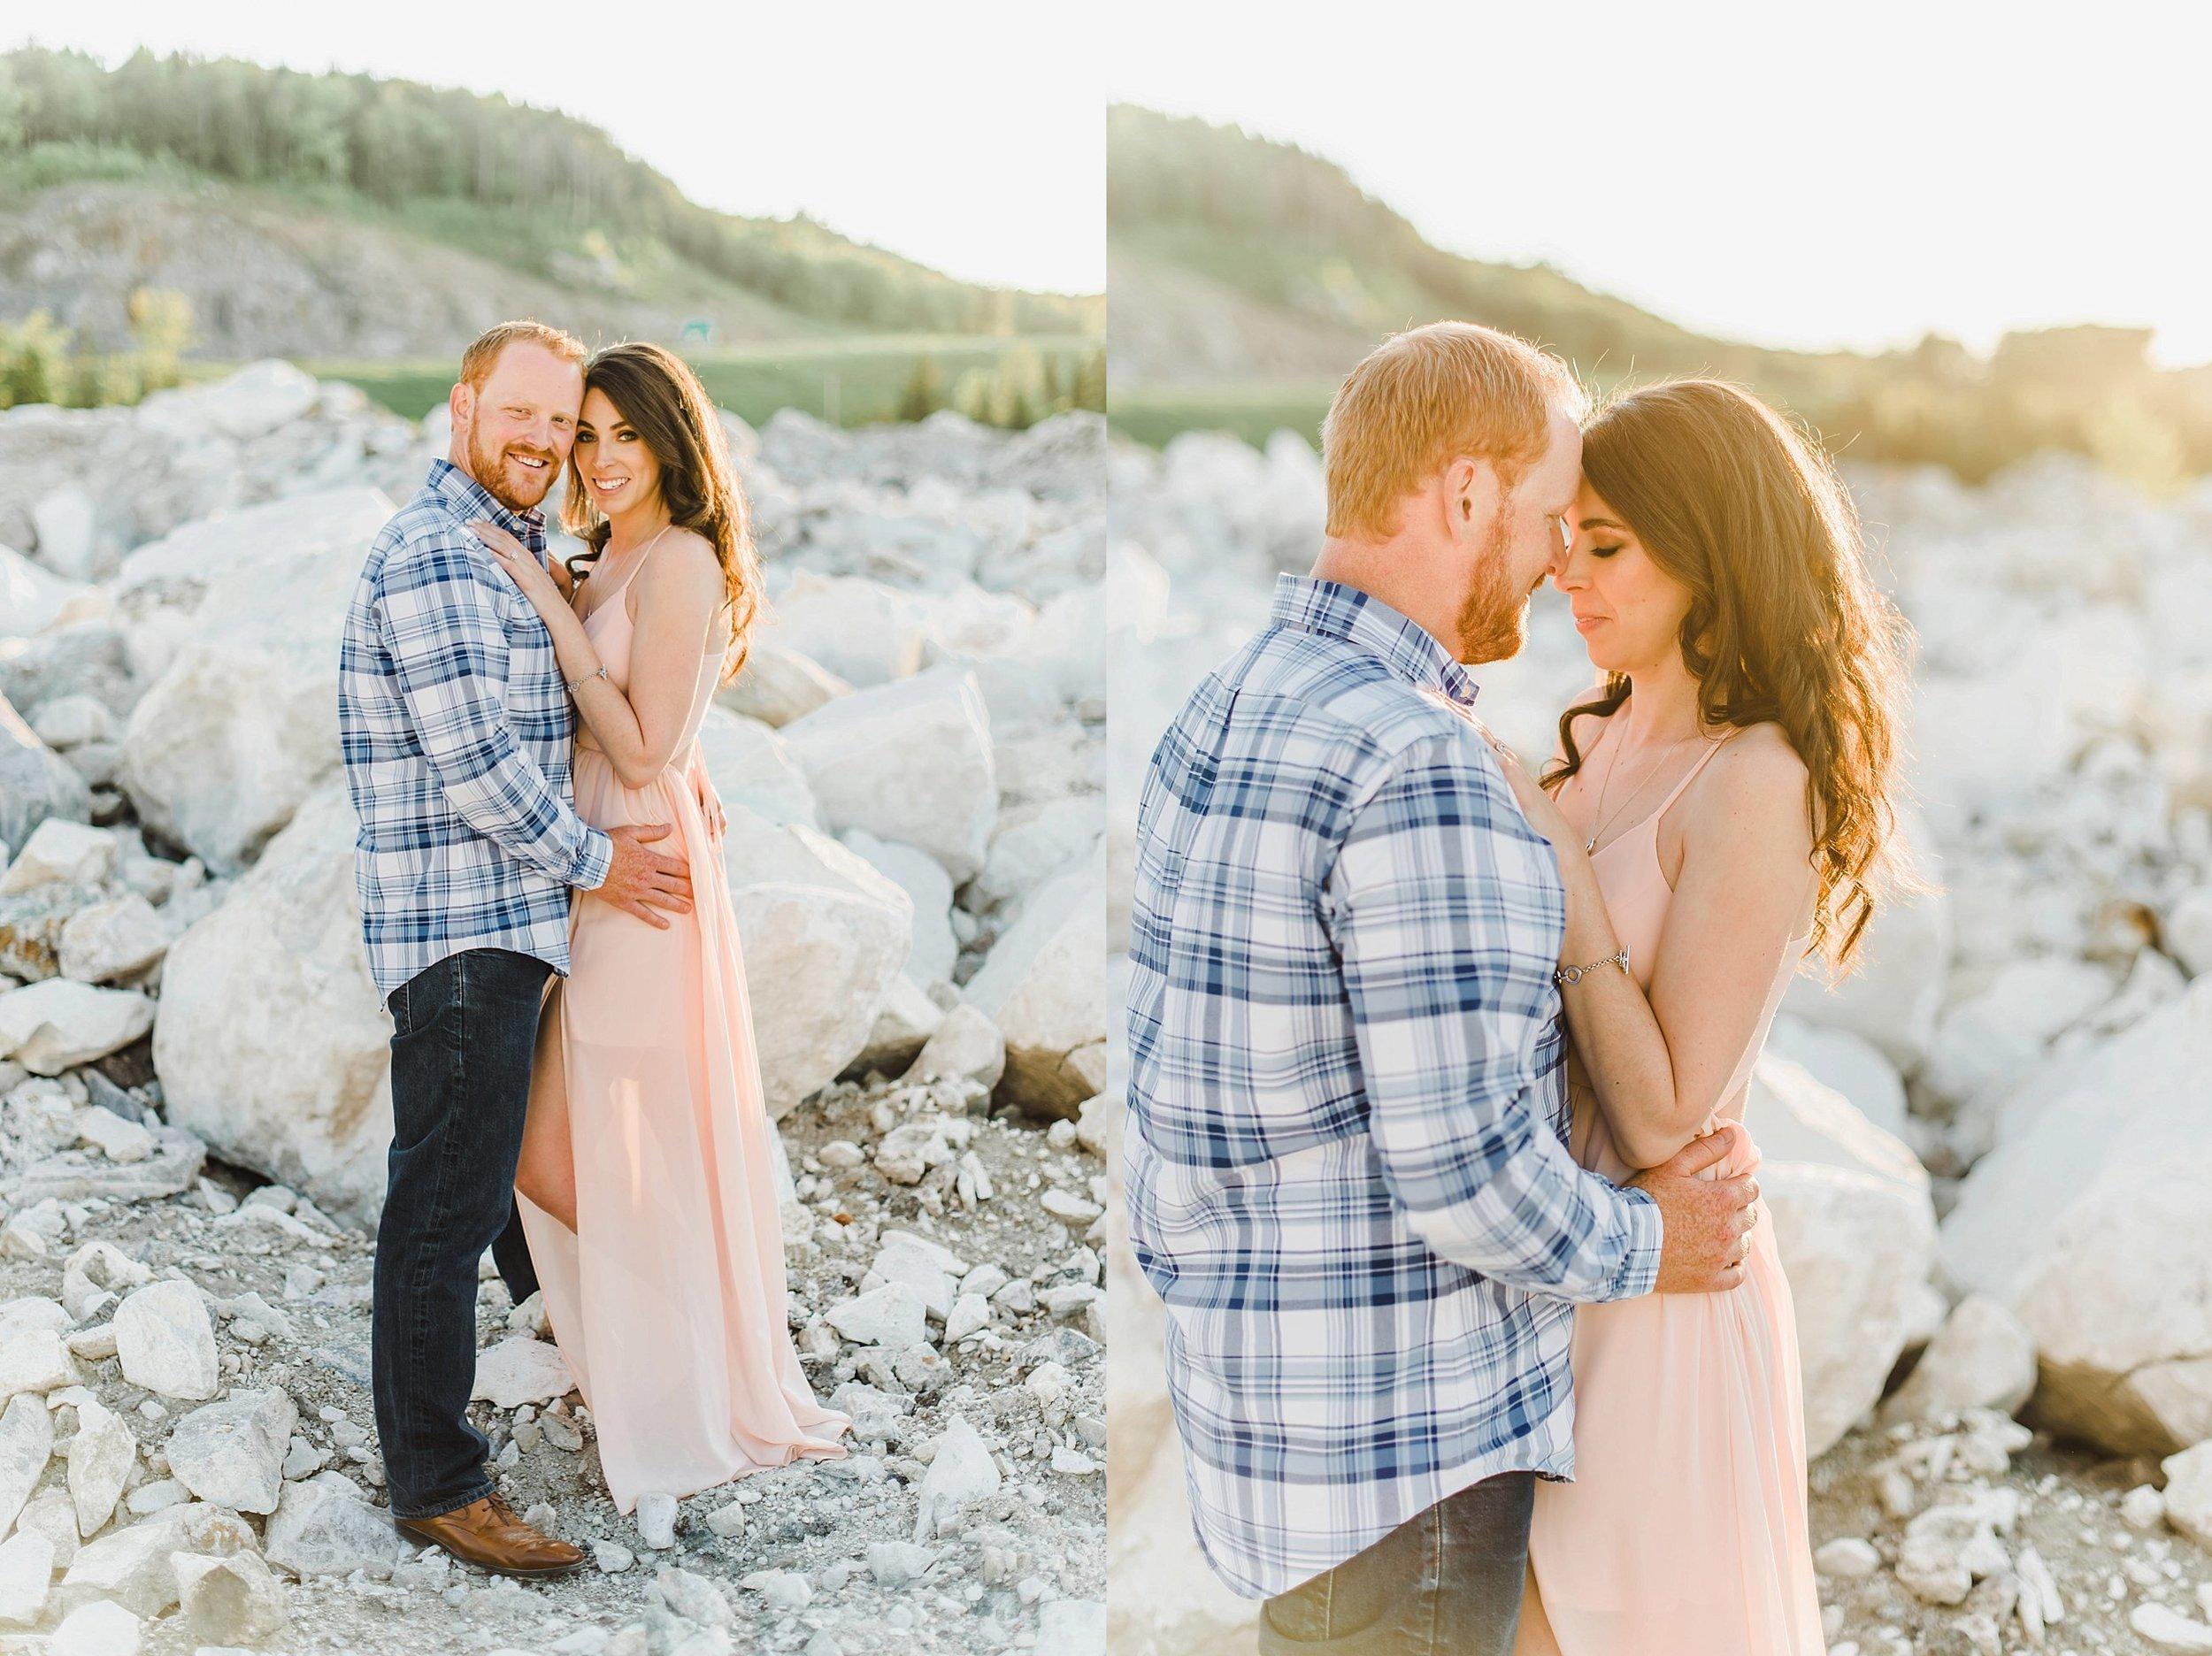 light airy indie fine art ottawa wedding photographer | Ali and Batoul Photography_0685.jpg